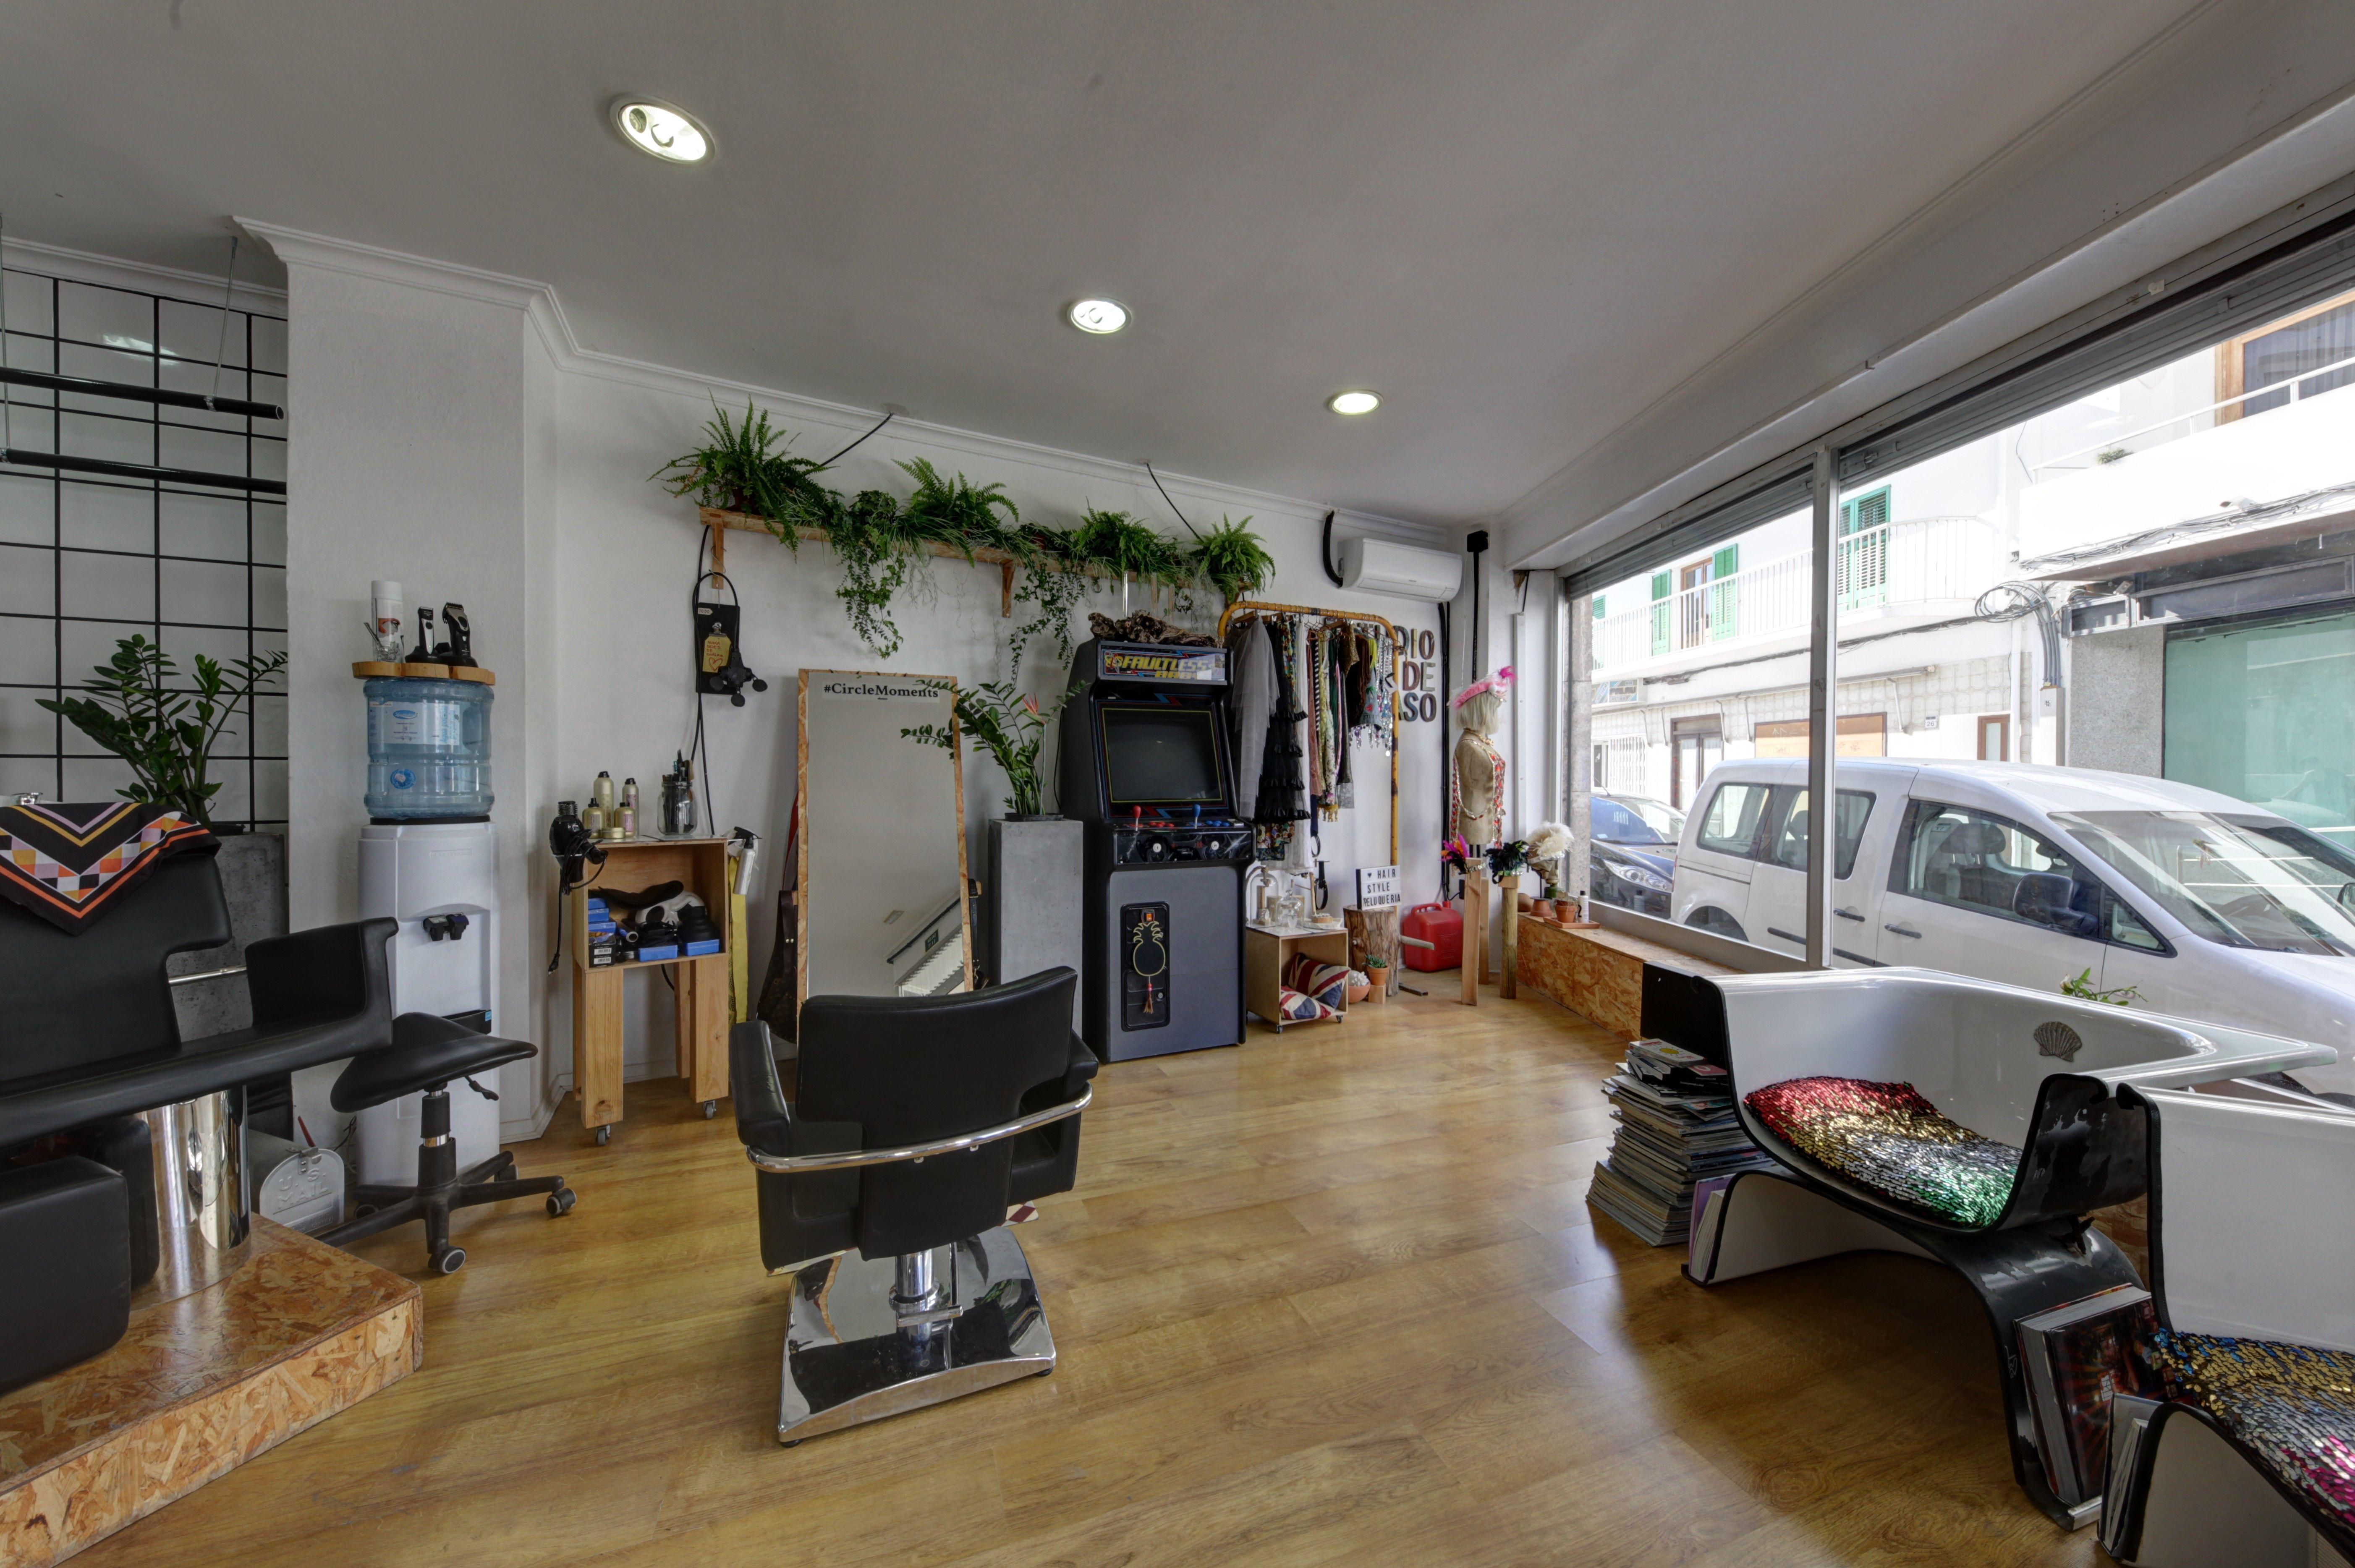 Foto 19 de Hair salons en Sant Antoni de Portmany | Estudio de Laso